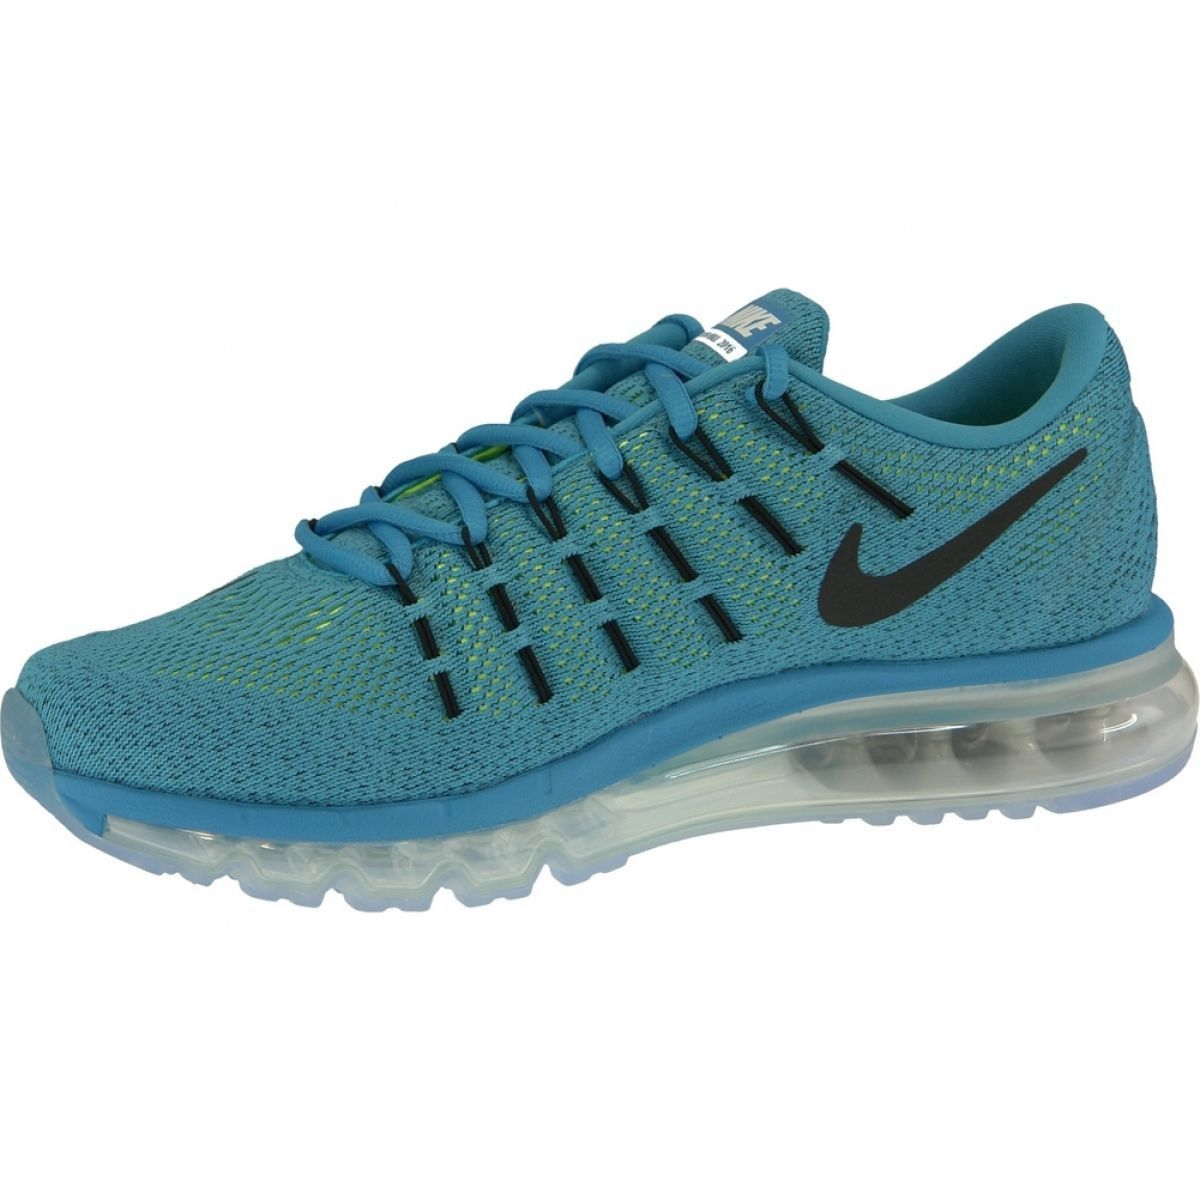 Buty Nike Air Max 2016 M 806771 400 Niebieskie Nike Air Max Nike Air Max 2016 Nike Air